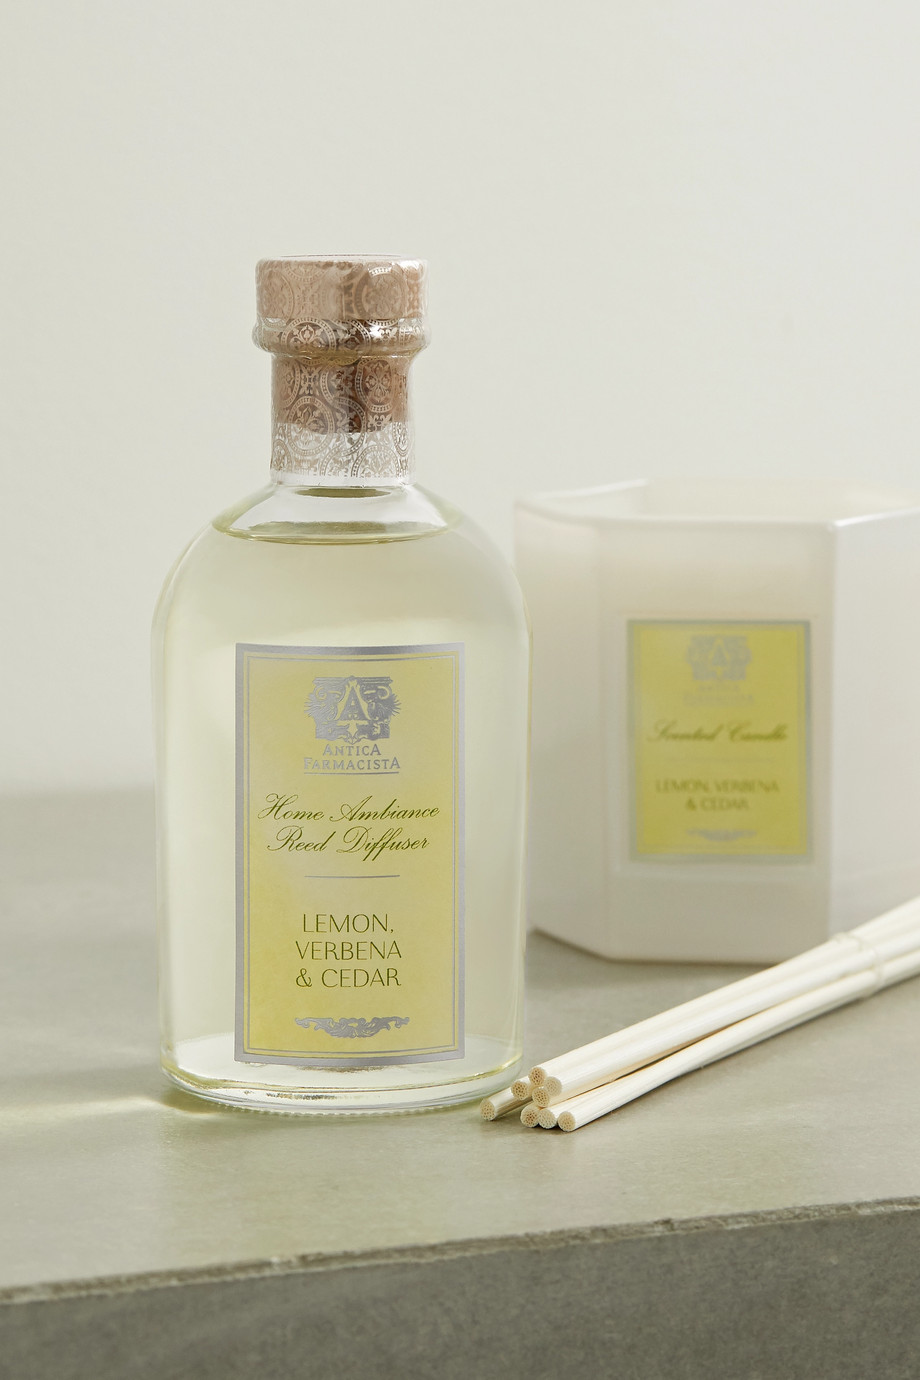 Antica Farmacista Lemon, Verbena & Cedar reed diffuser, 250ml